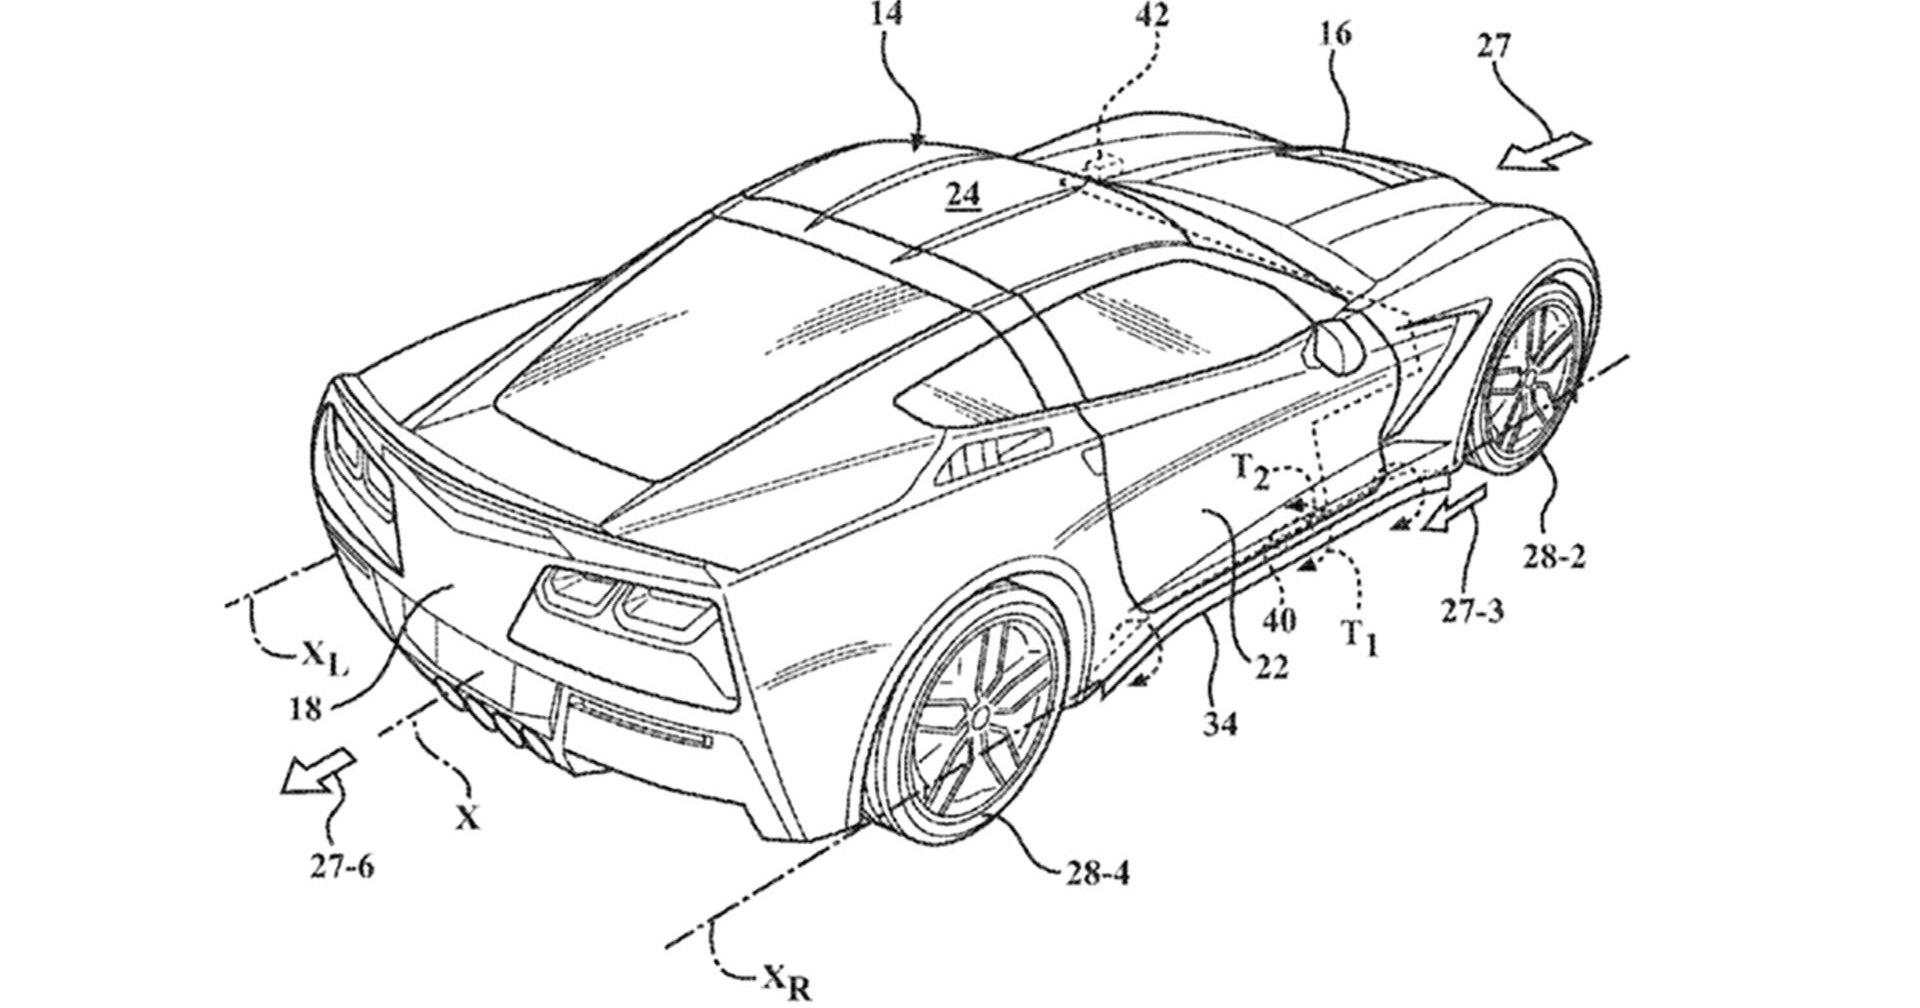 Chevrolet Corvette получит активную аэродинамику